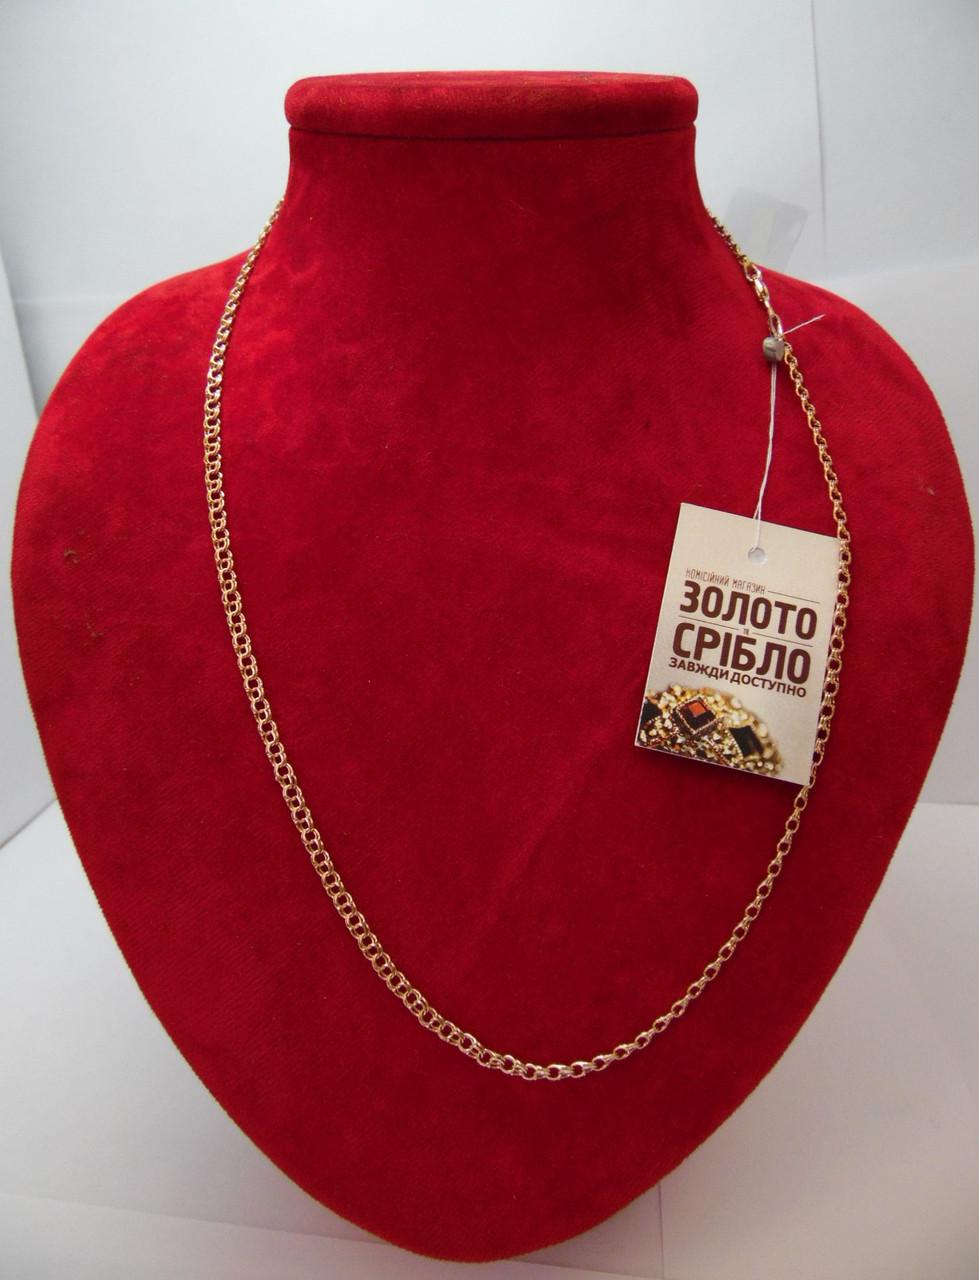 169cf886994e Цепь золотая, вес 7,28 грамм, 54 см, б у. , цена 7 644 грн., купить ...